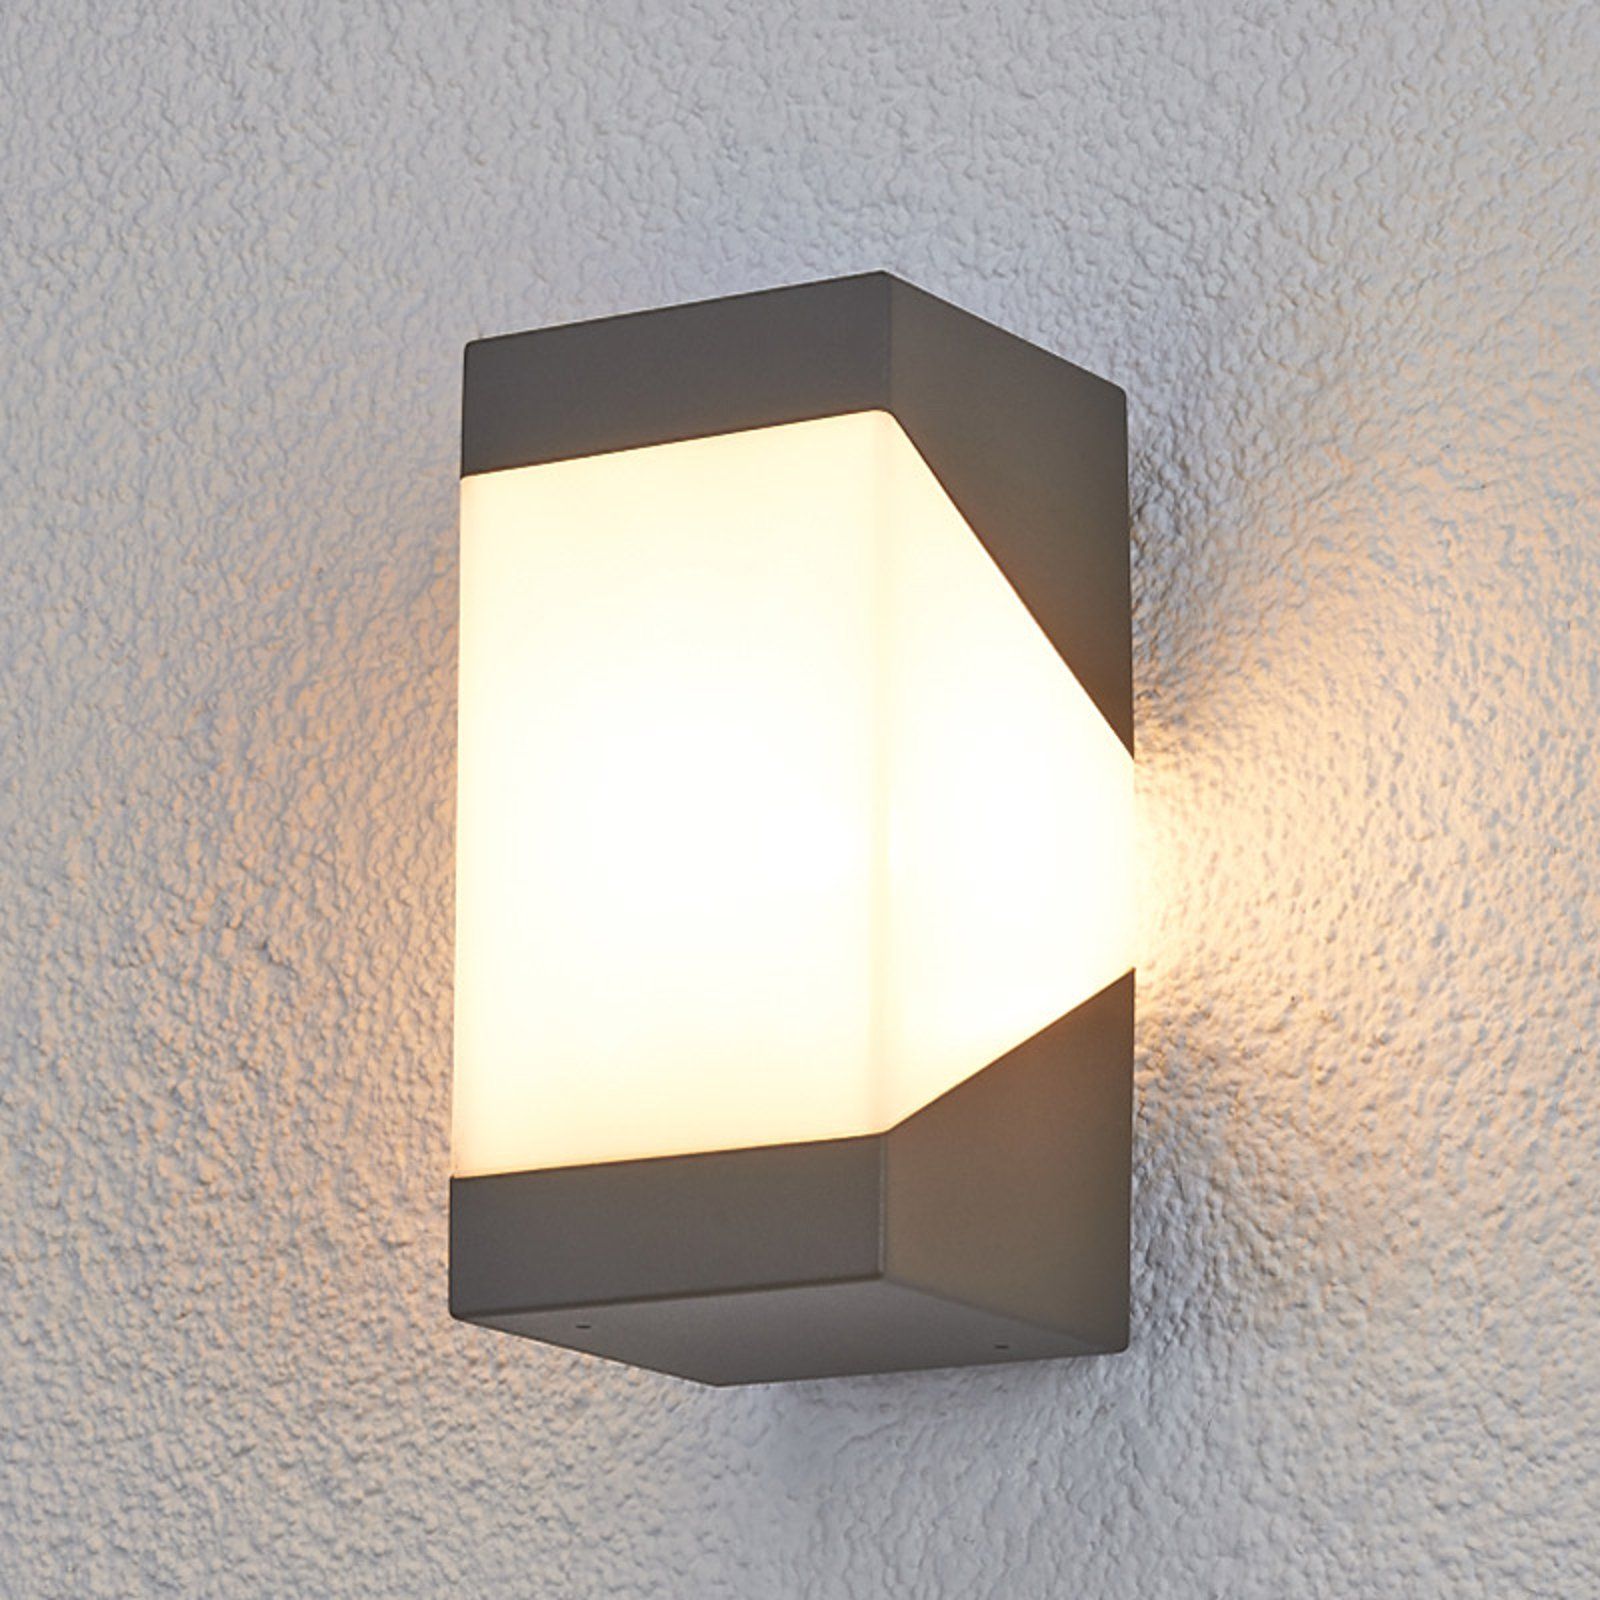 Effektfull Lutevegglampe Kiran